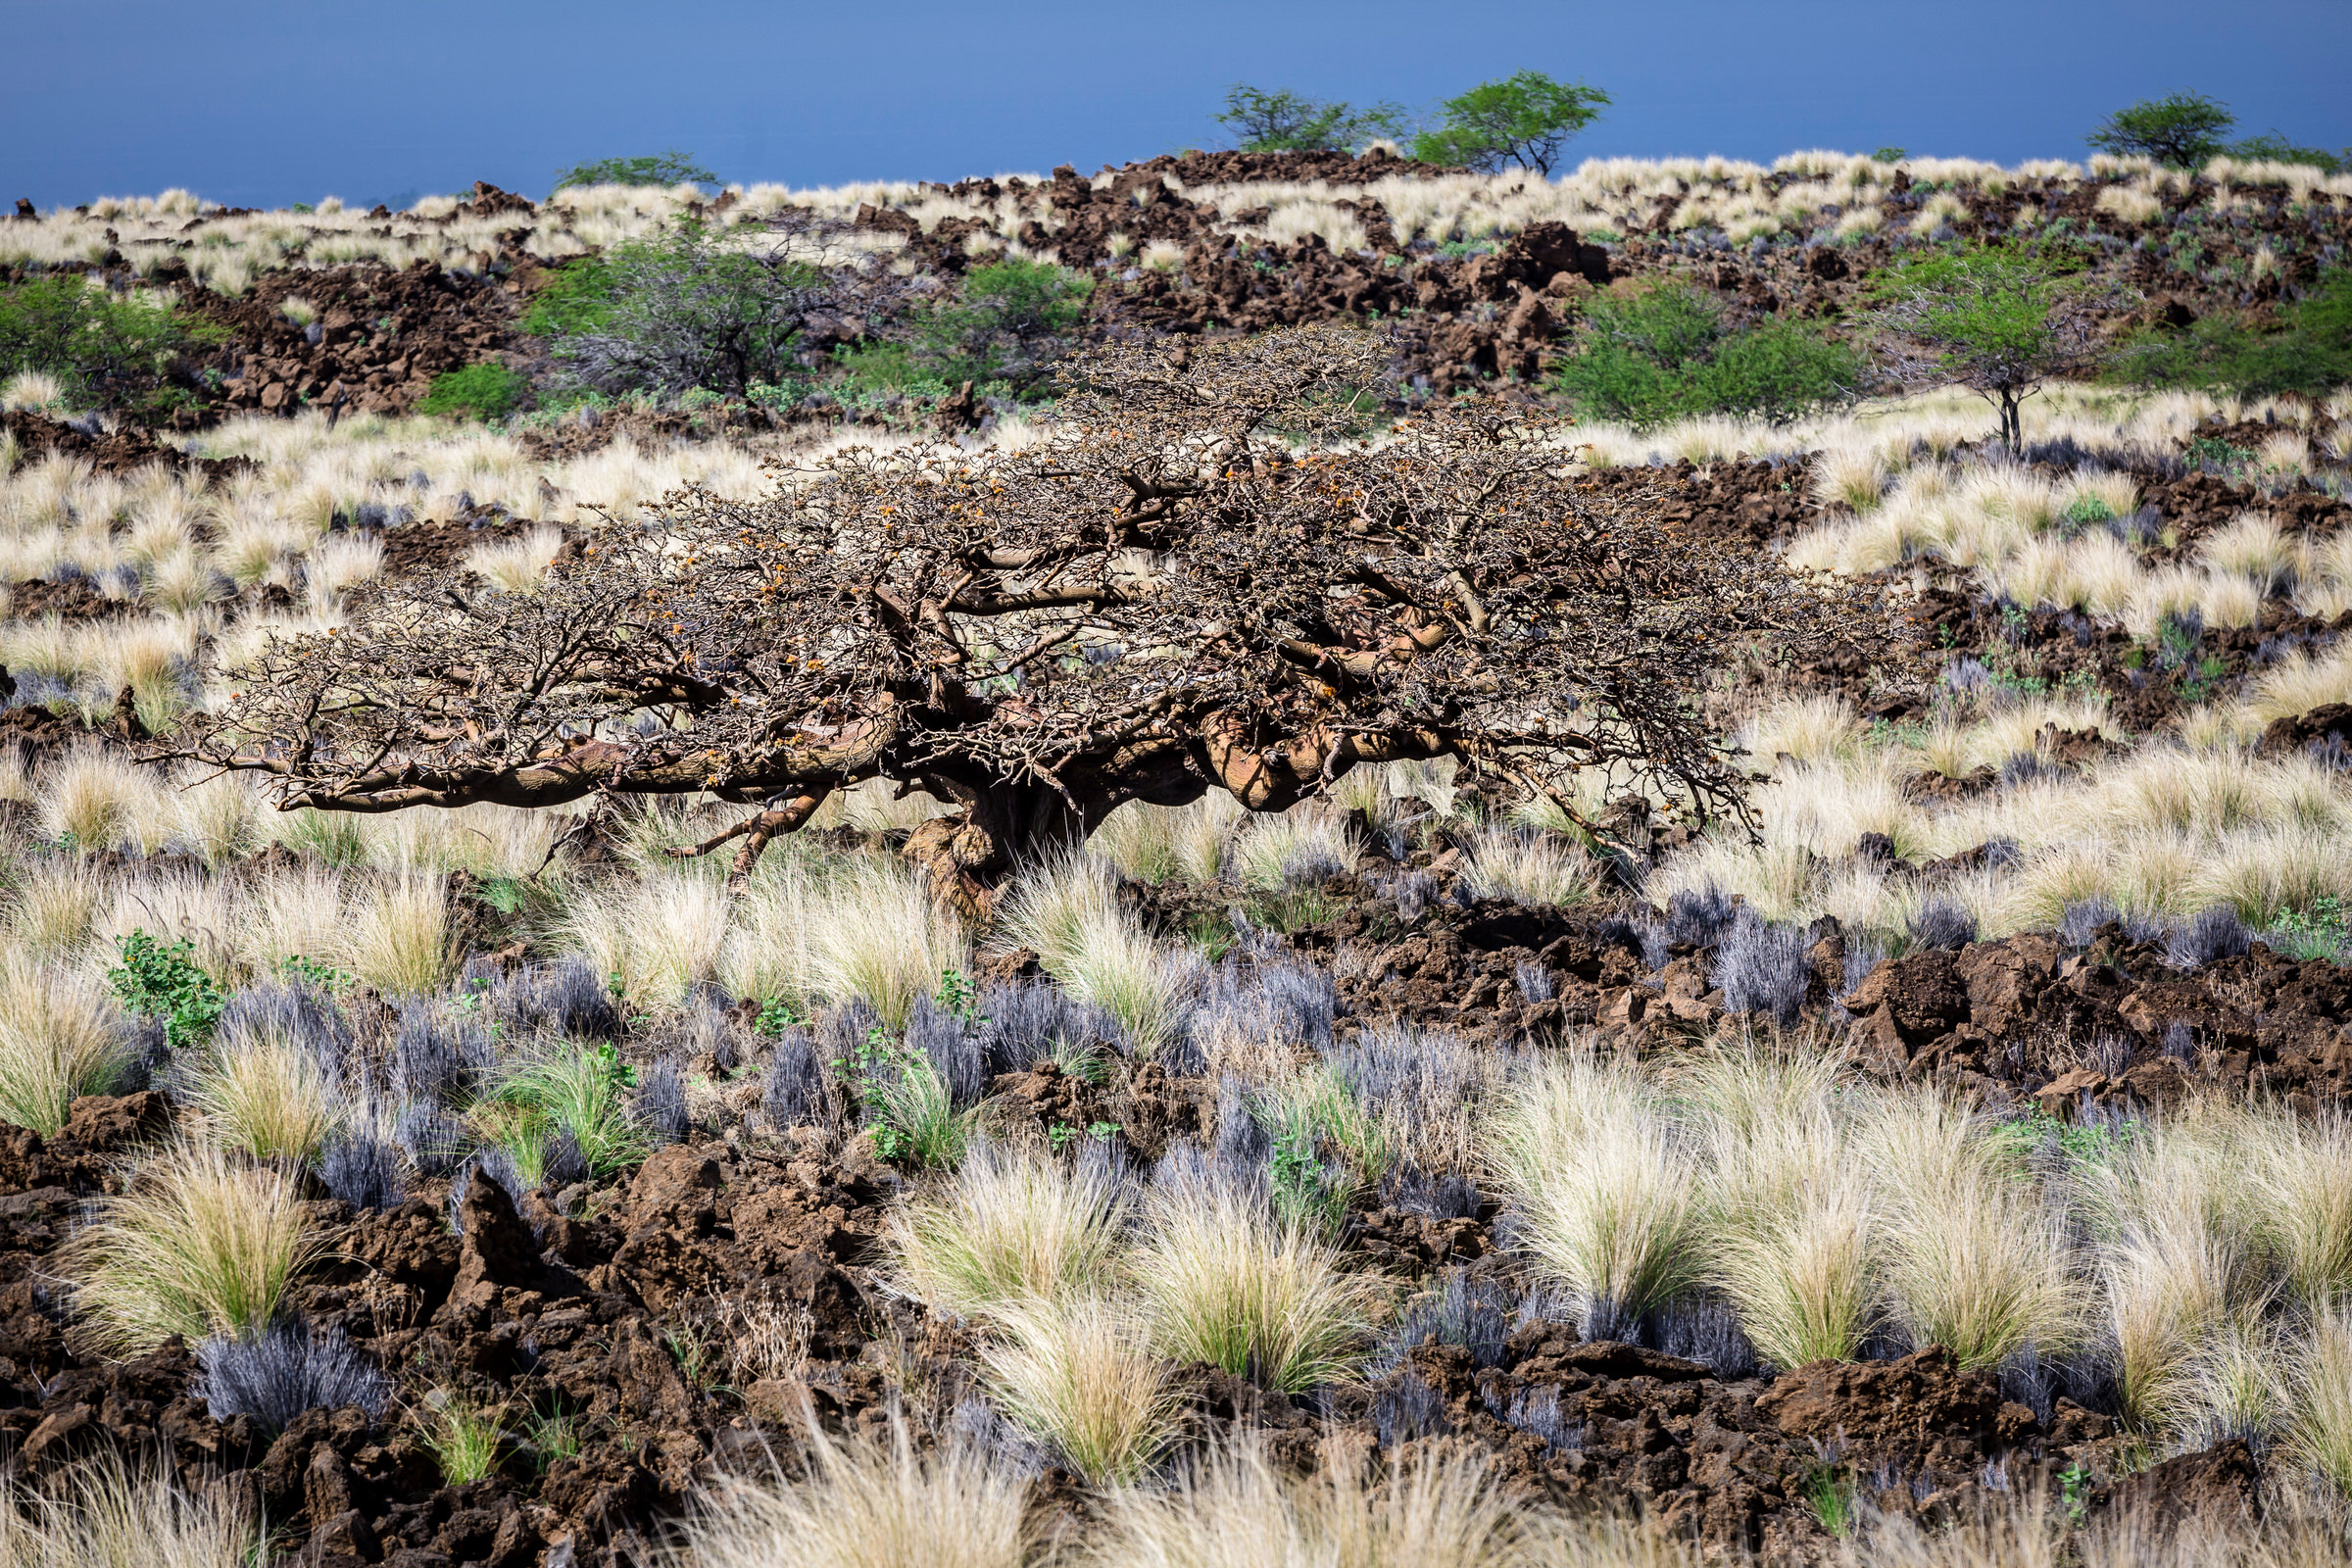 dry-forest0landscape-willi-willi-tree-festival-Waikoloa-Village-Hawaii-Island-South-Kohala-314.jpg